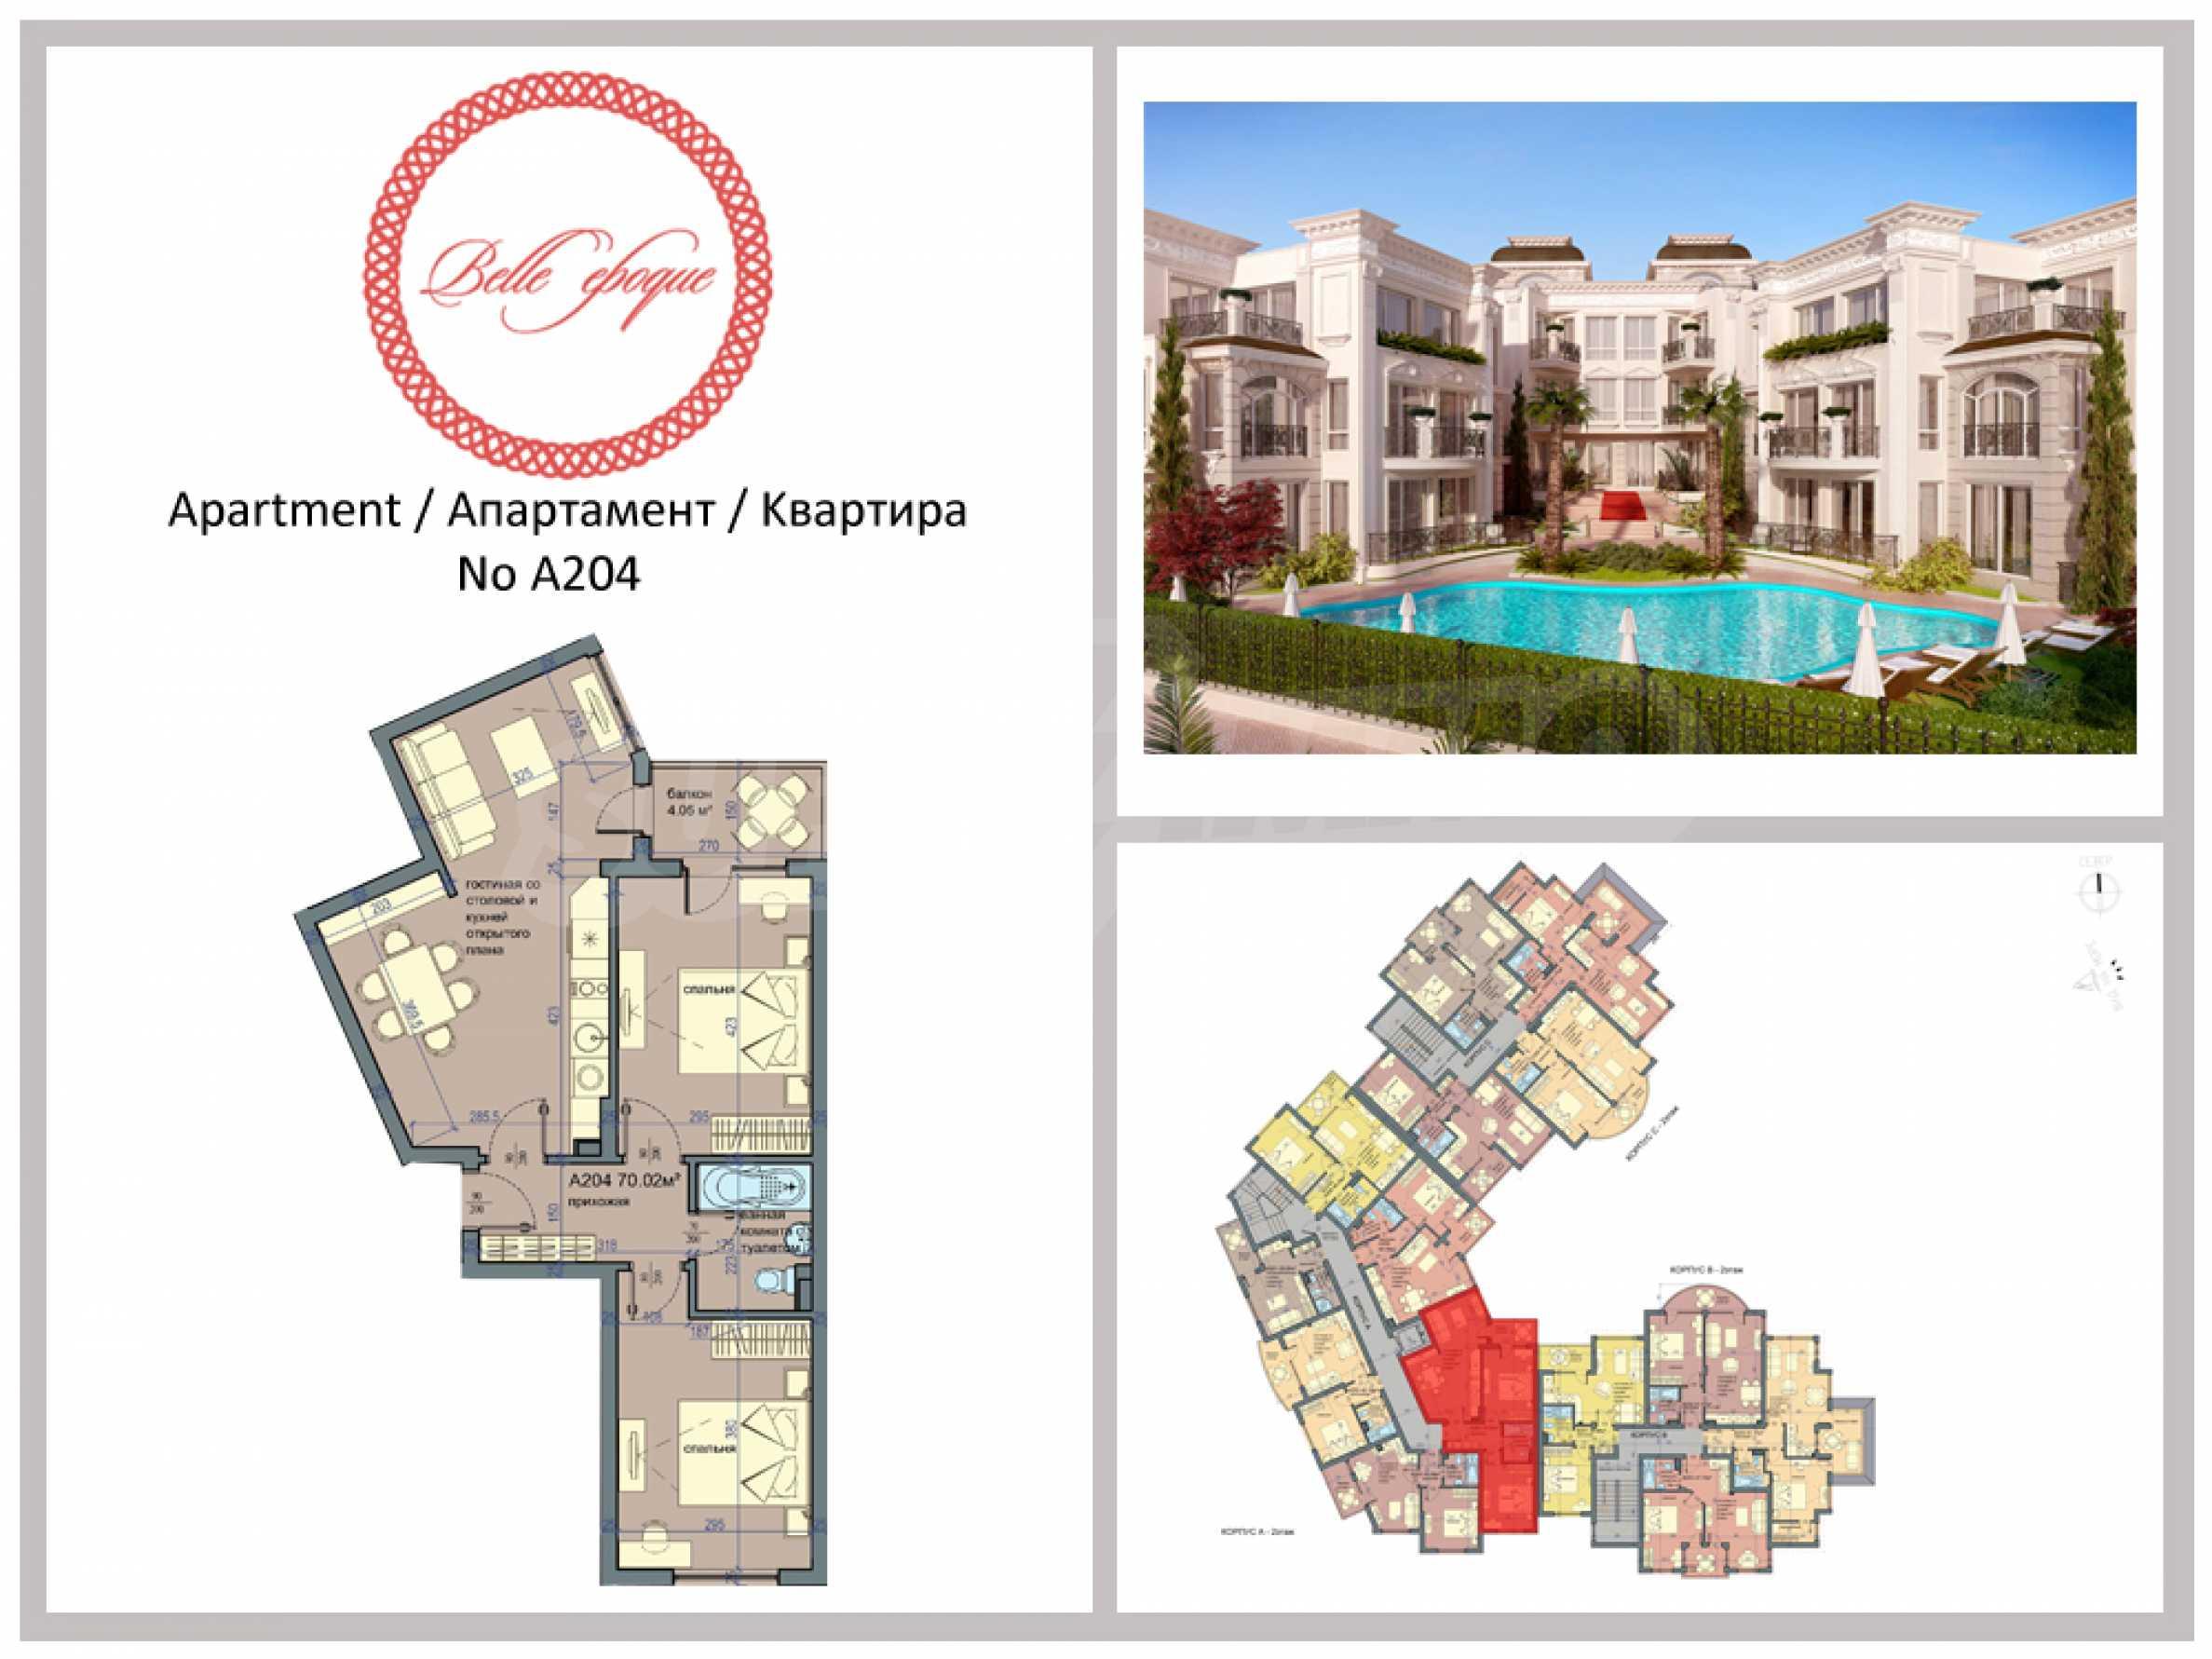 Exclusive 2-bedroom beachfront apartment in the prestigious Belle Époque Beach Residence 60